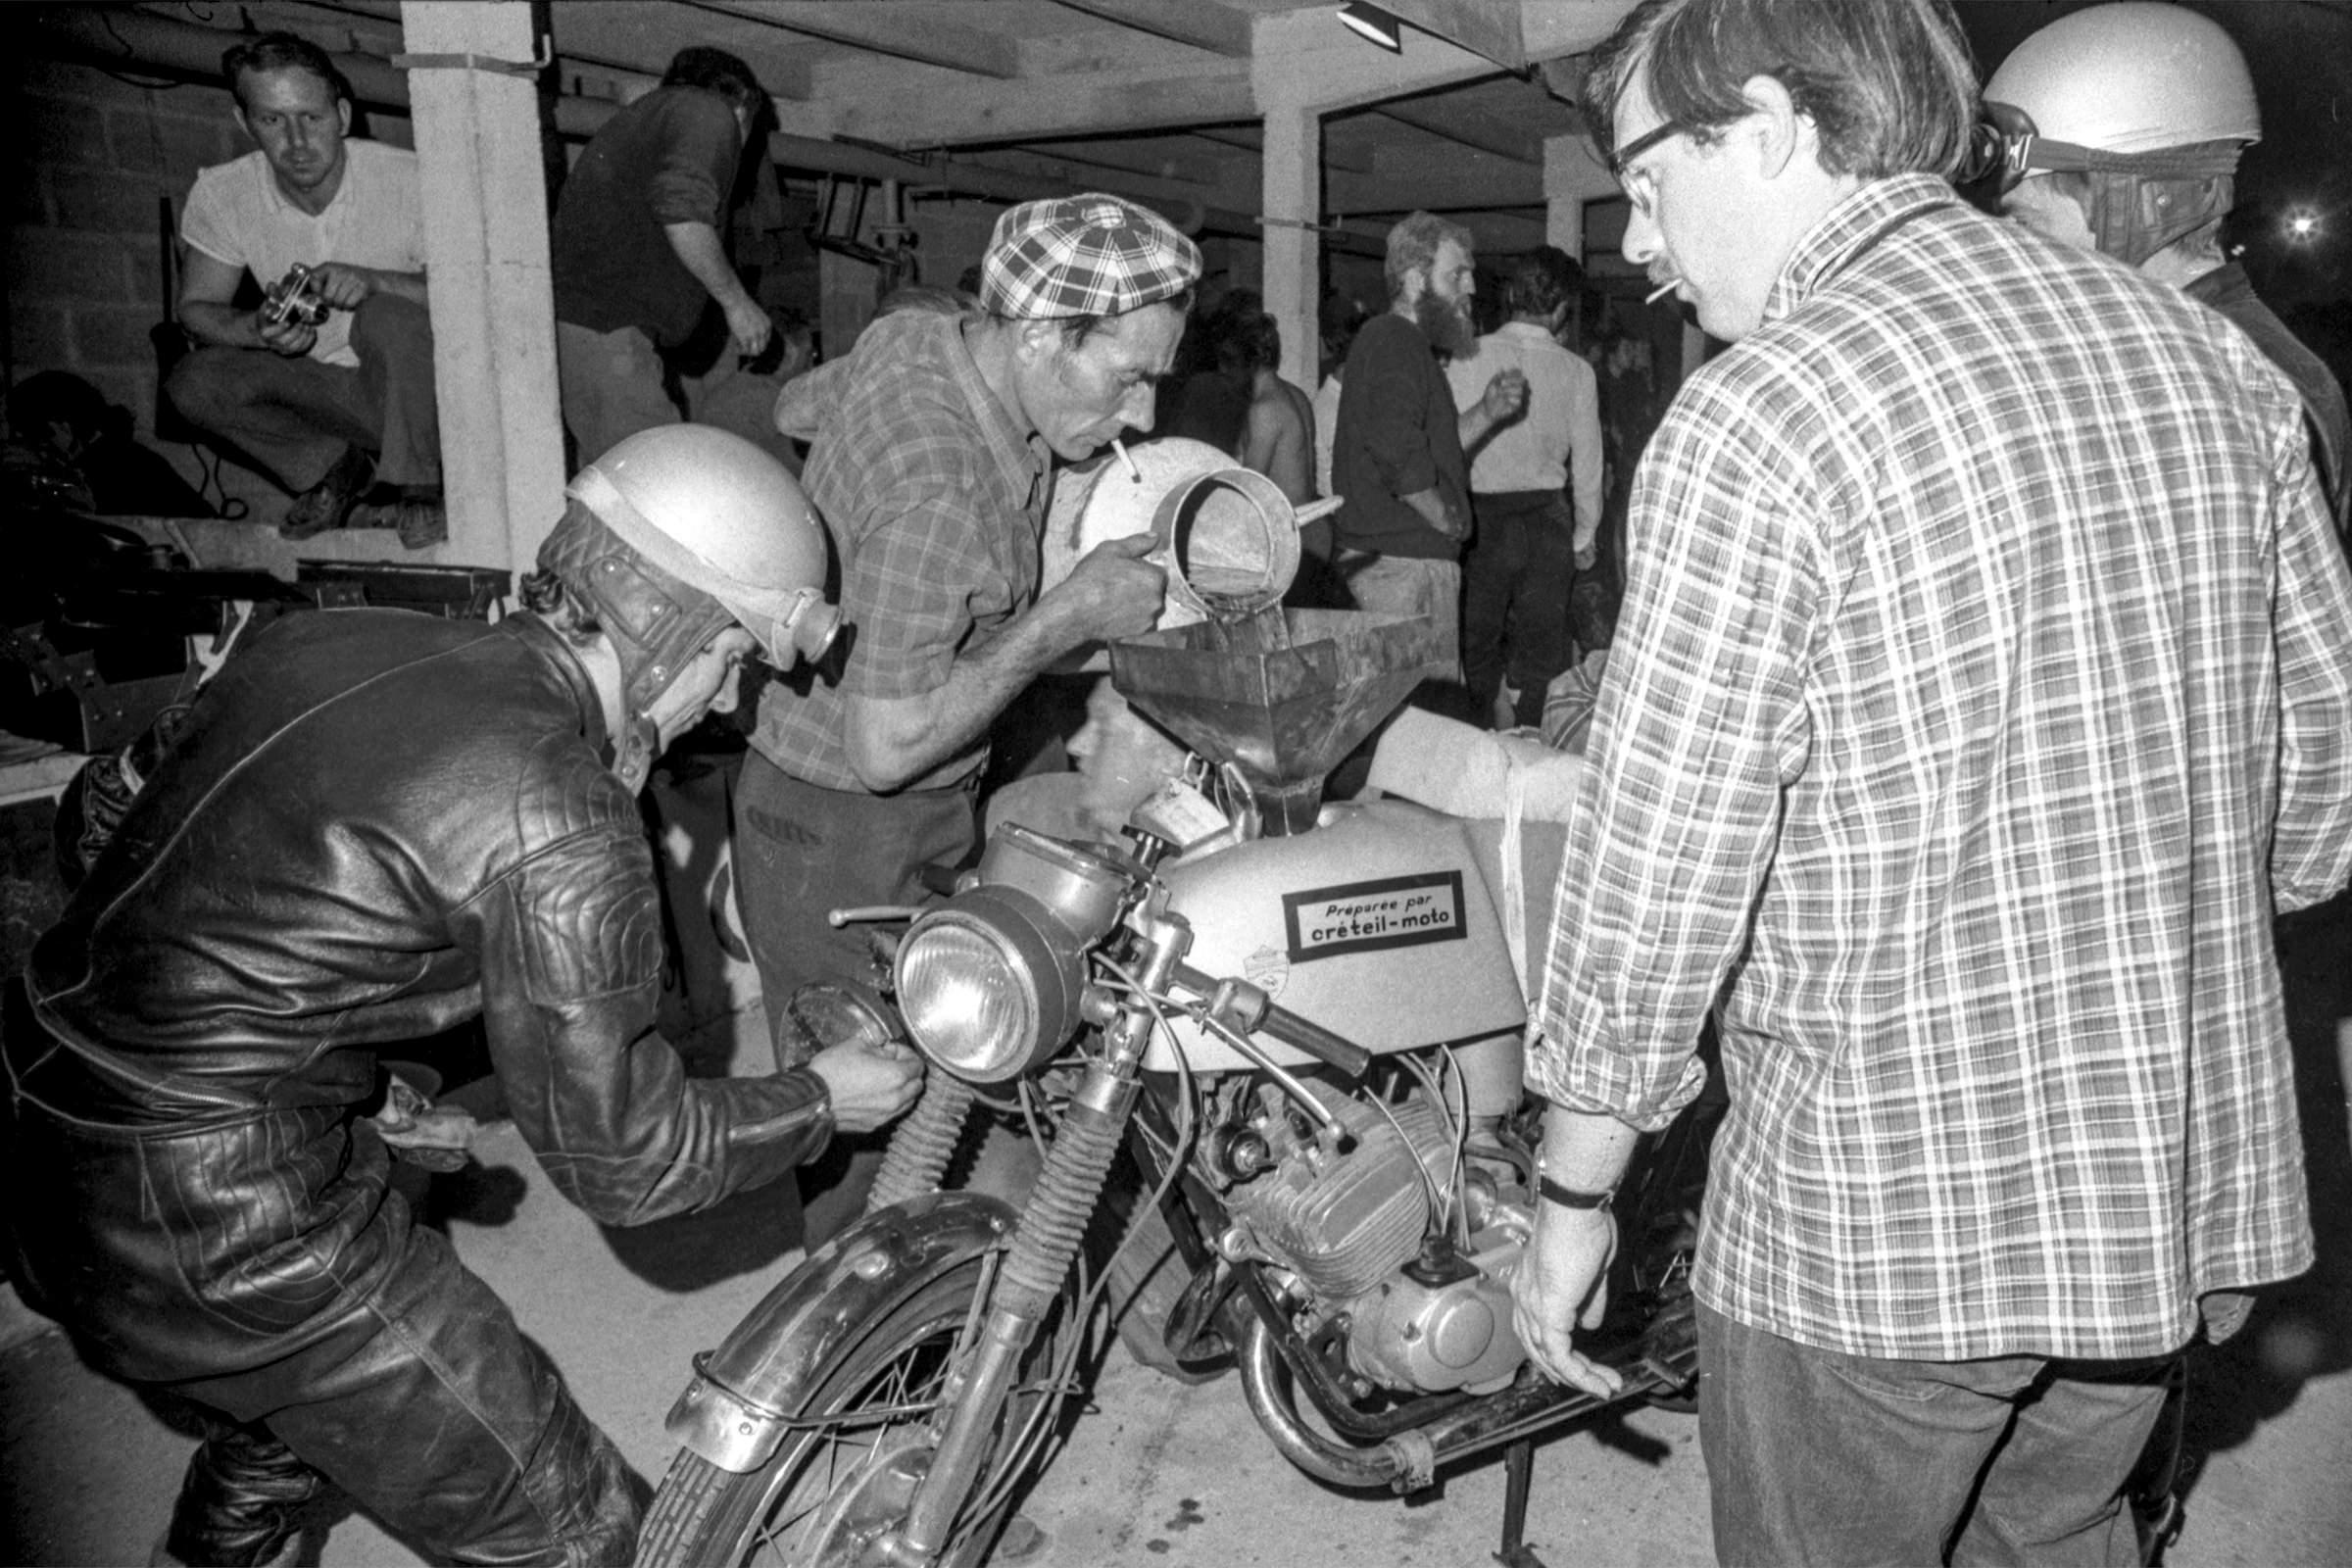 Bol d'Or Motorcycle Race